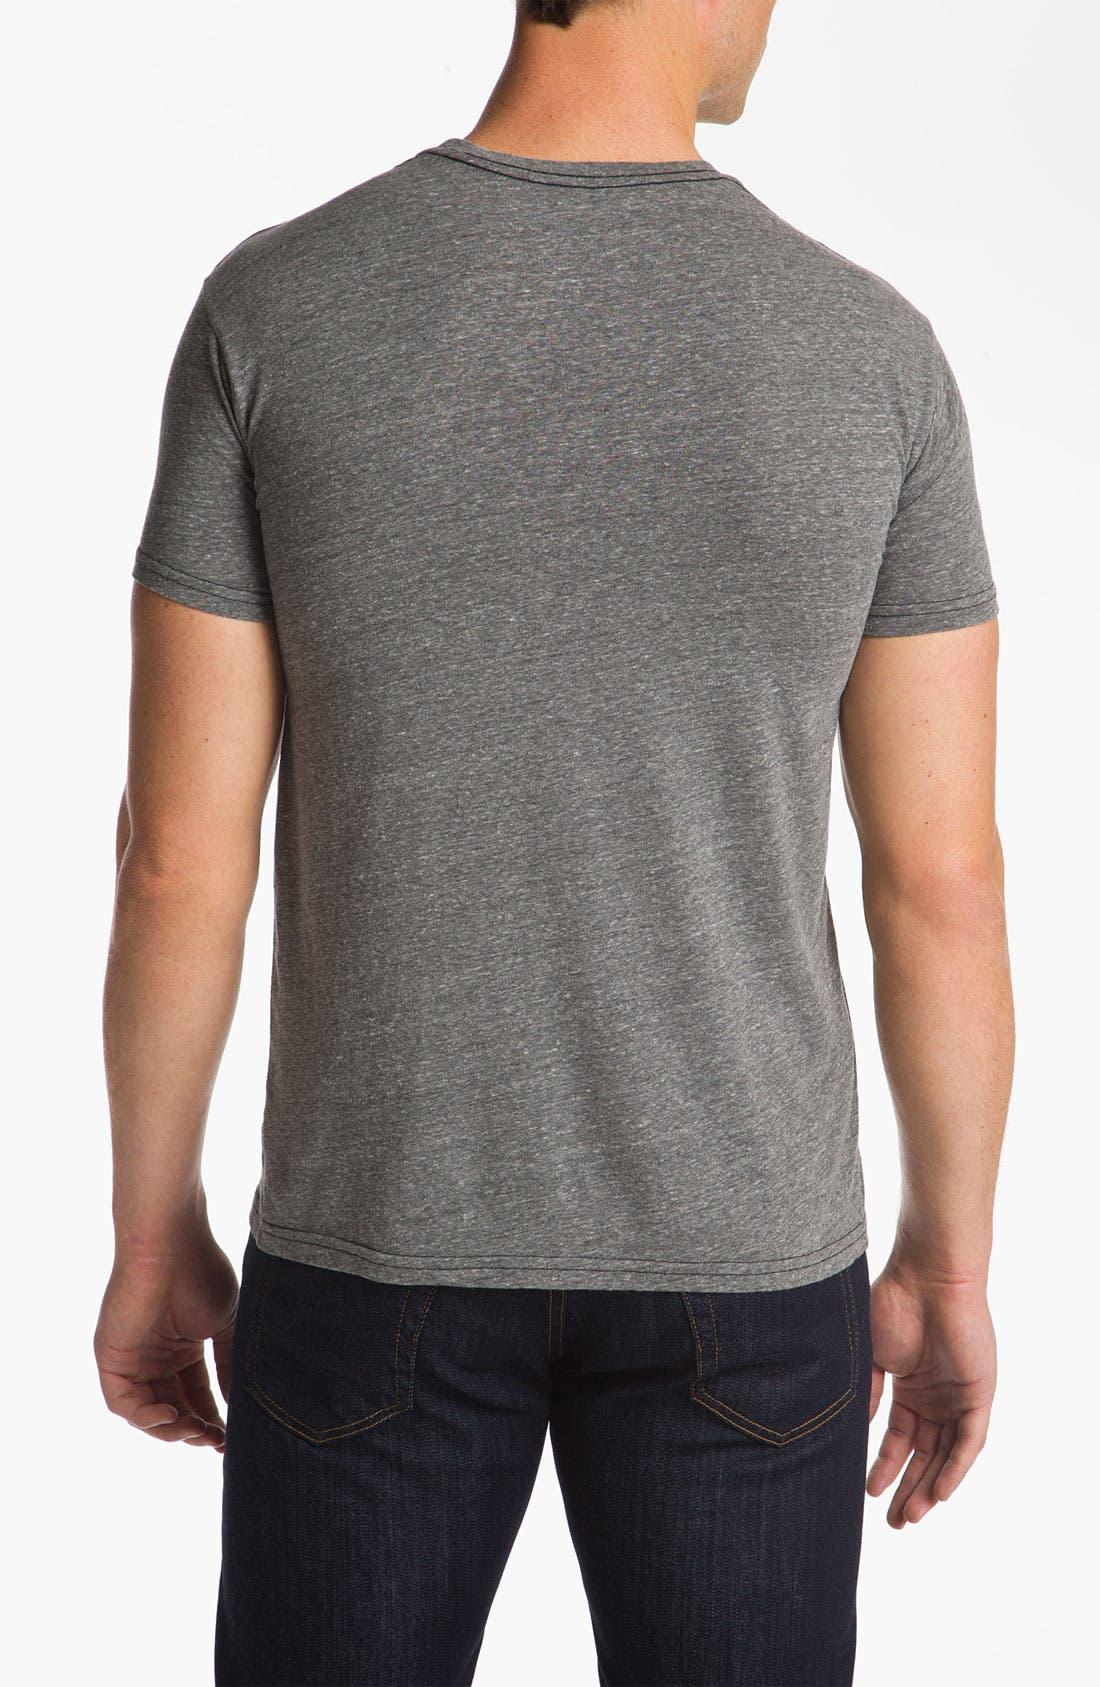 Alternate Image 2  - The Original Retro Brand 'Penn State Nittany Lions' Crewneck T-shirt (Men)